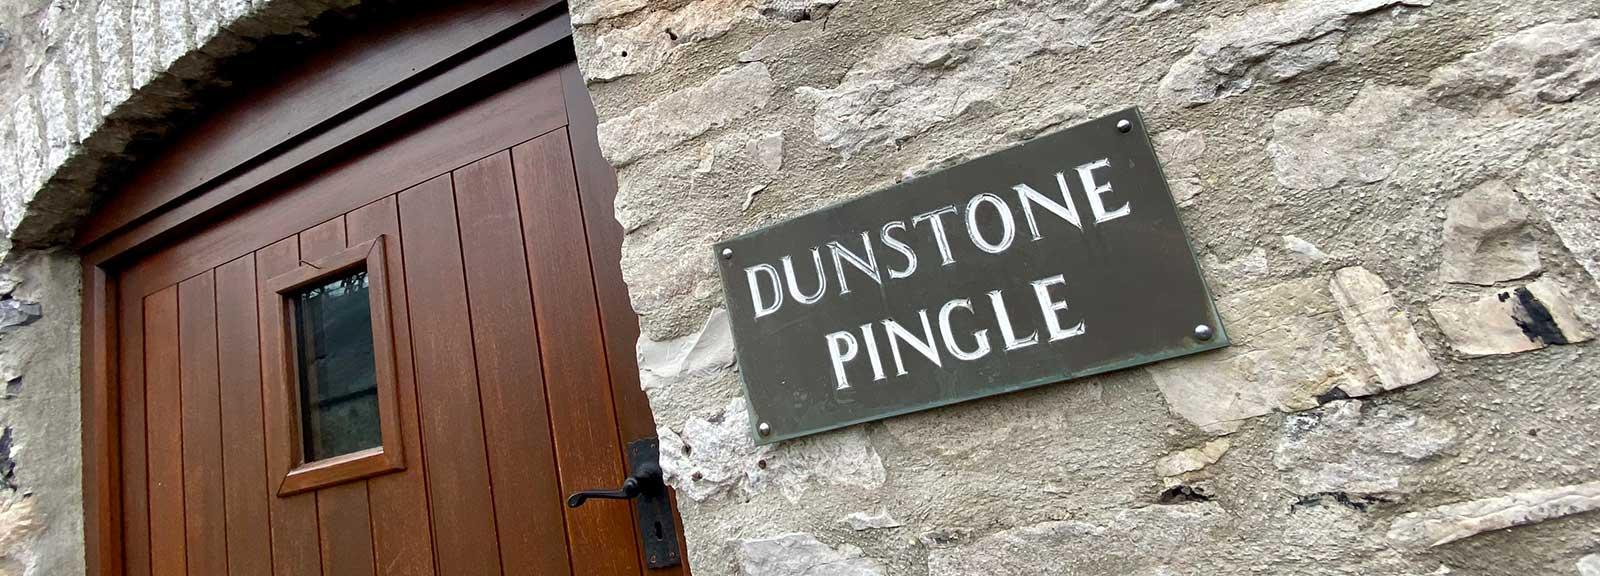 Dunston Pingle